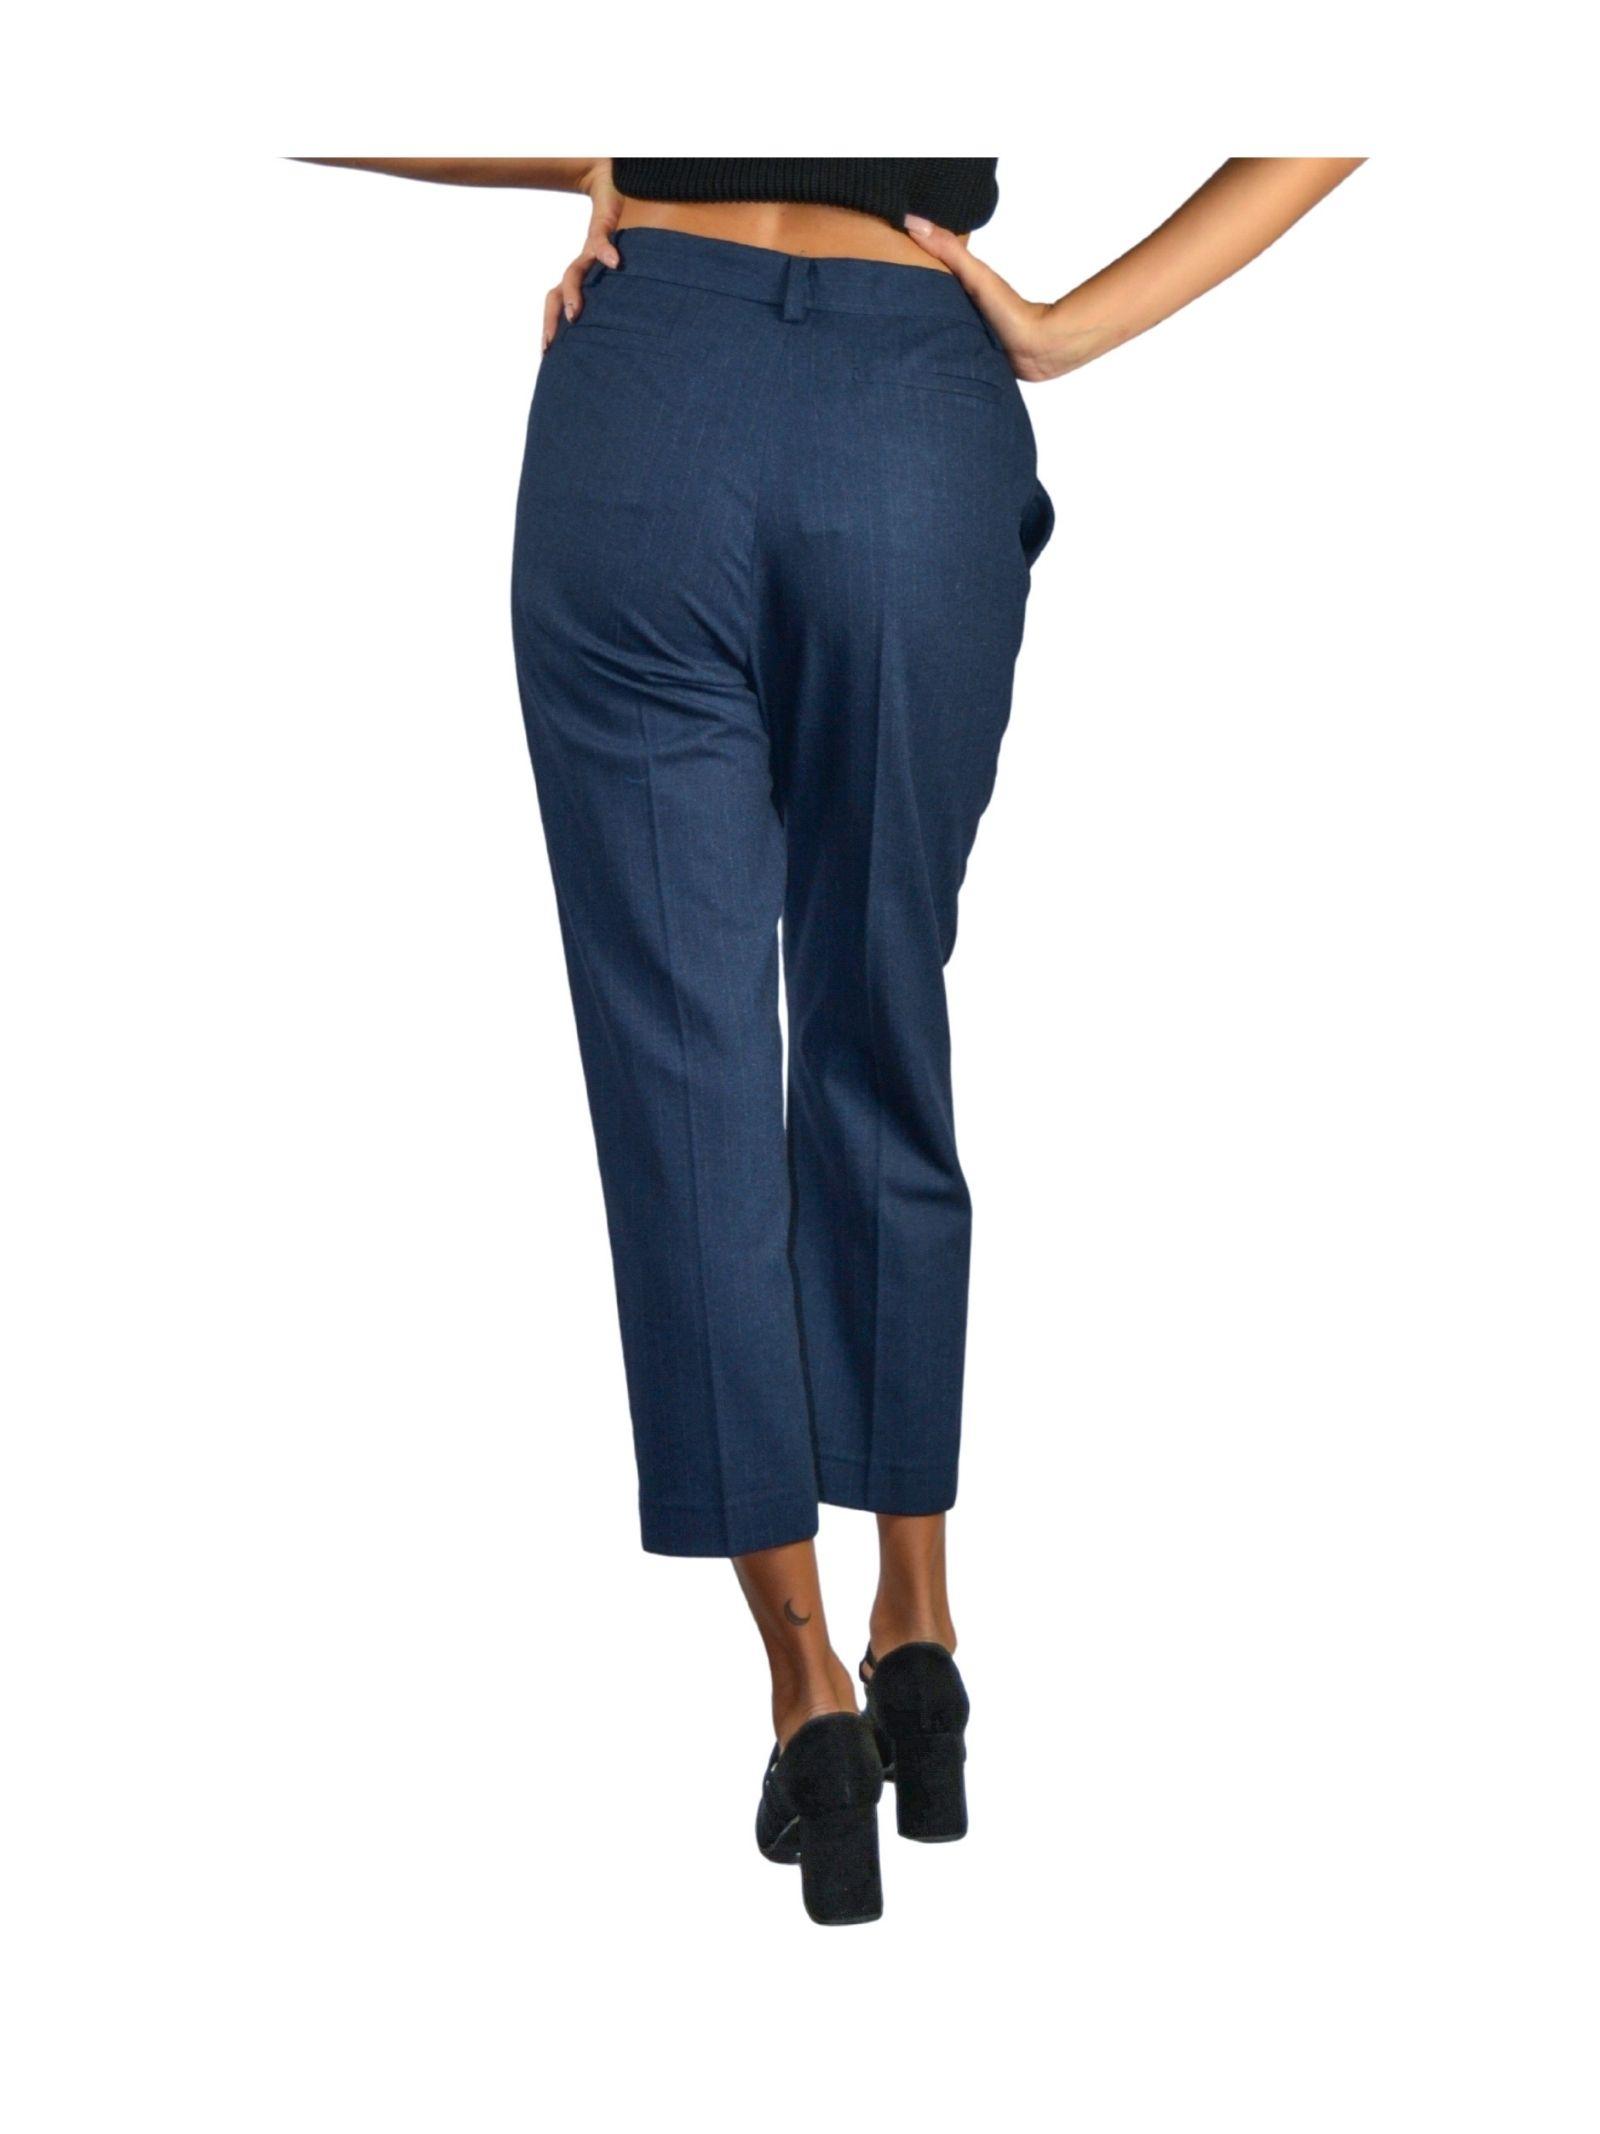 Pantalone Donna Blu Navy Maliparmi | Gonne e Pantaloni | JH70532018780025